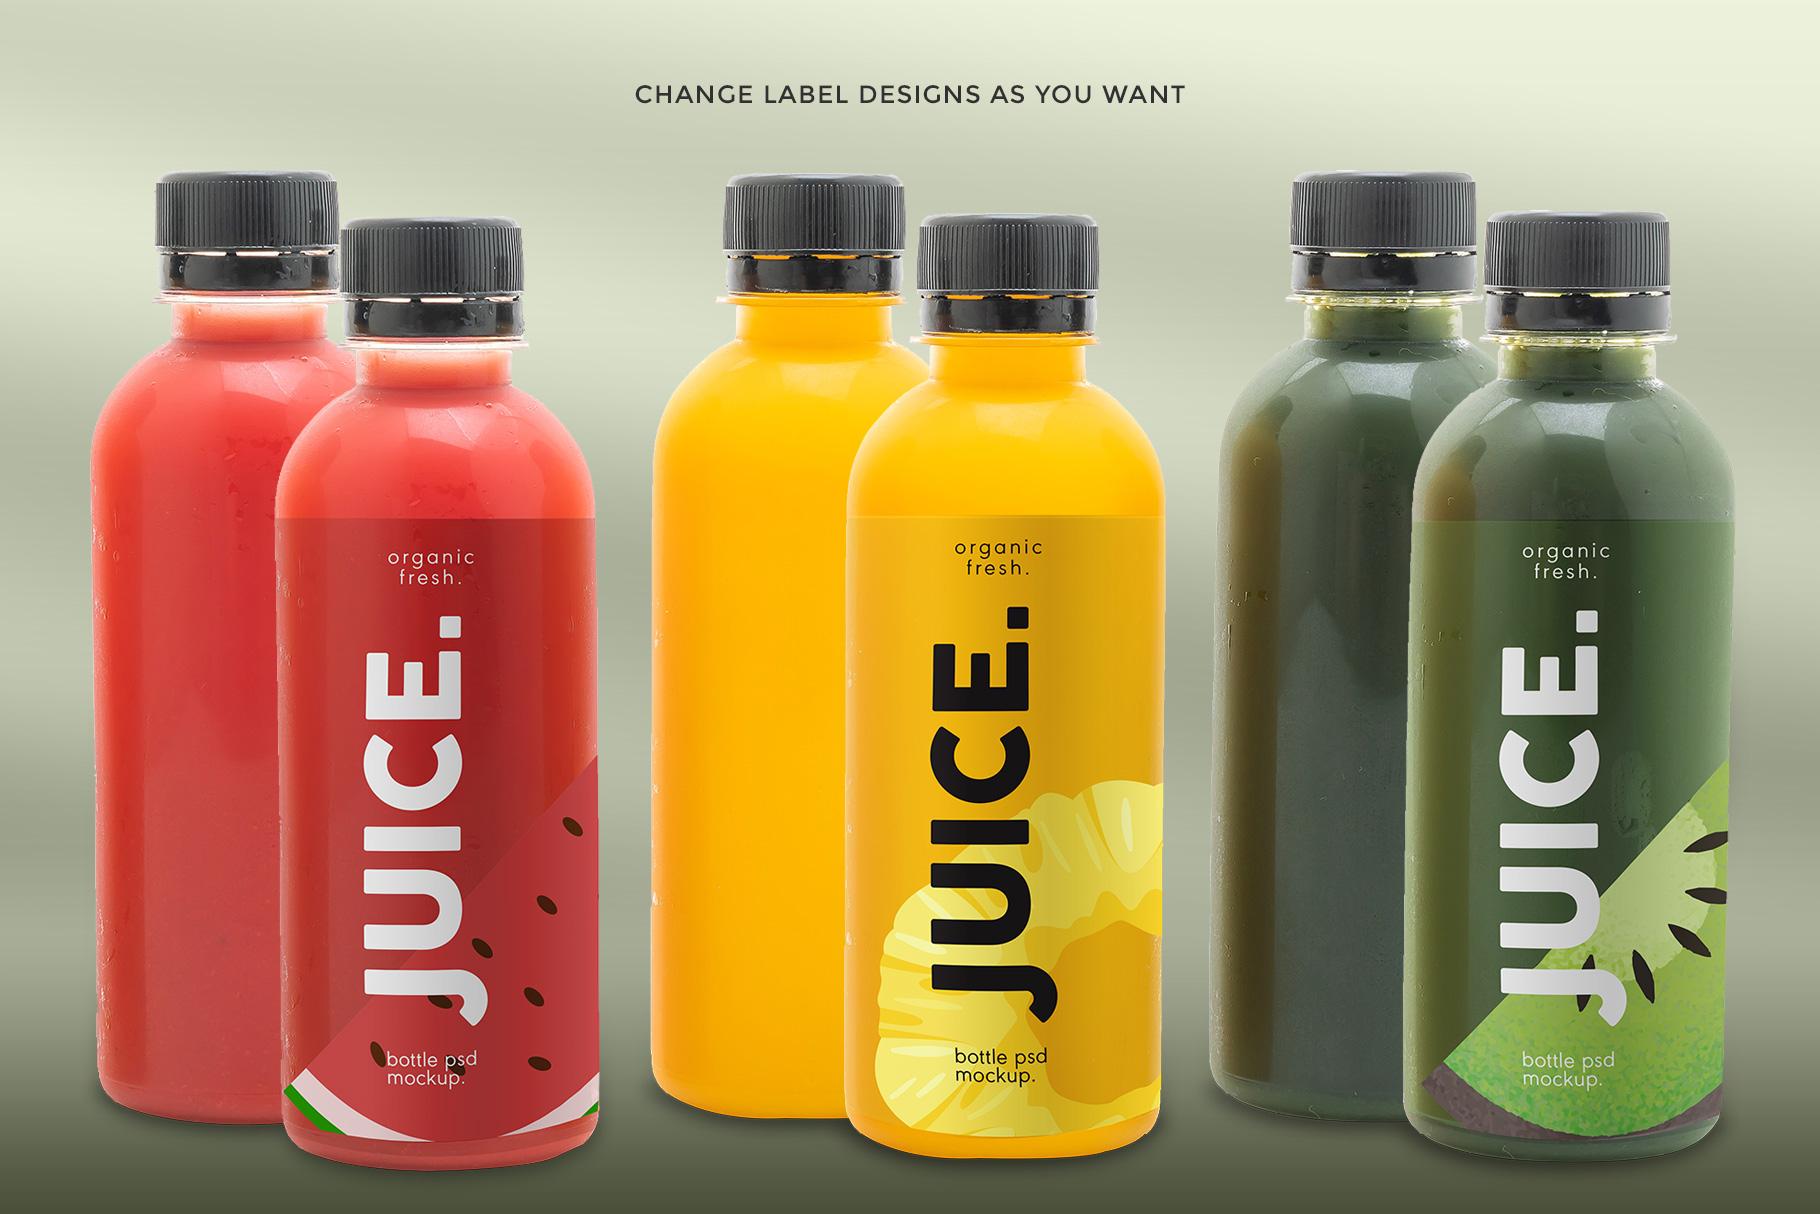 variations of the plastic health drink bottles packaging mockup